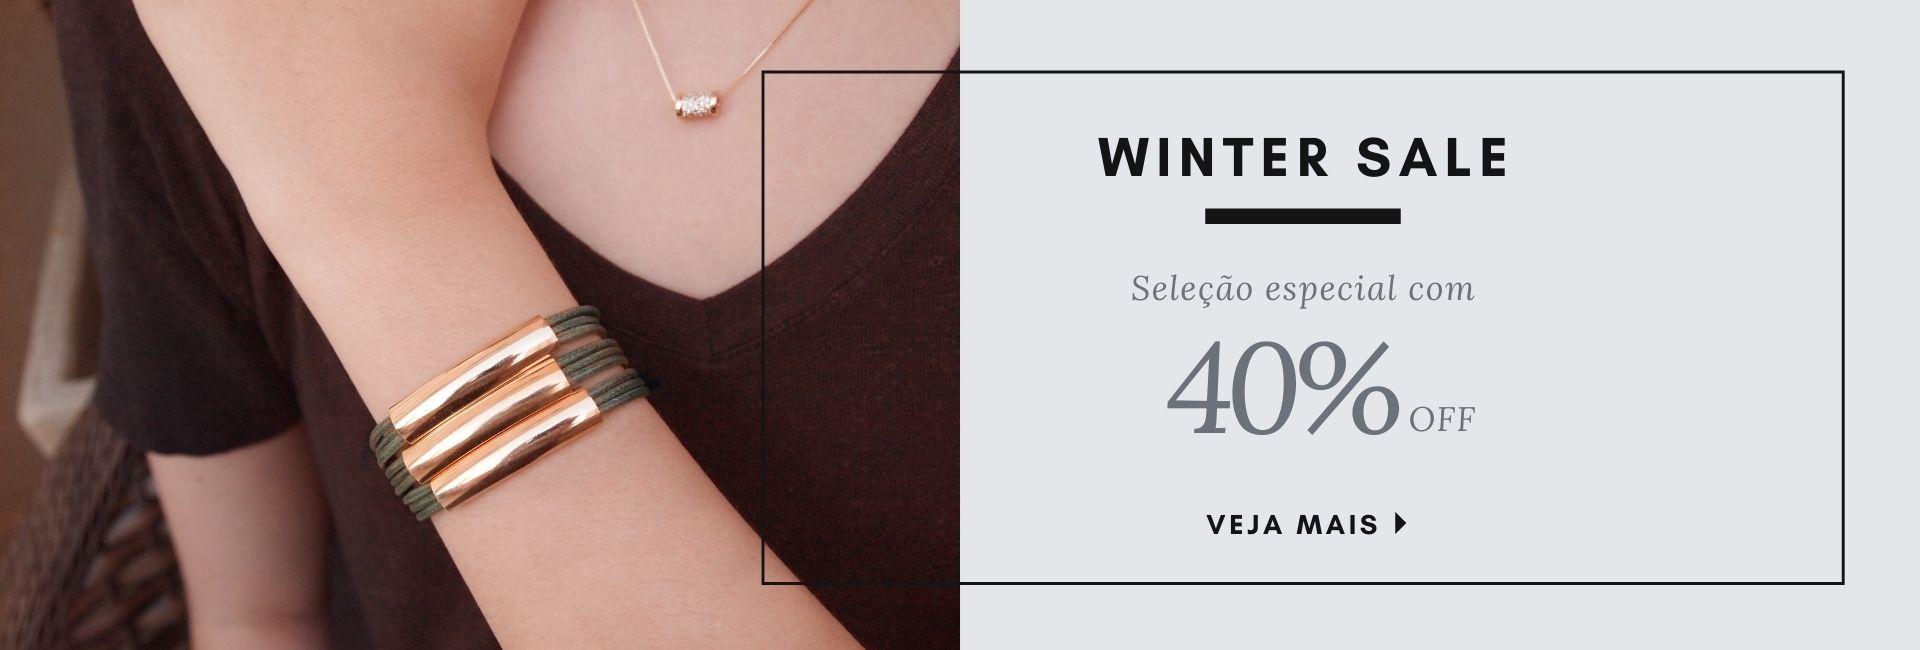 Winter sale 3